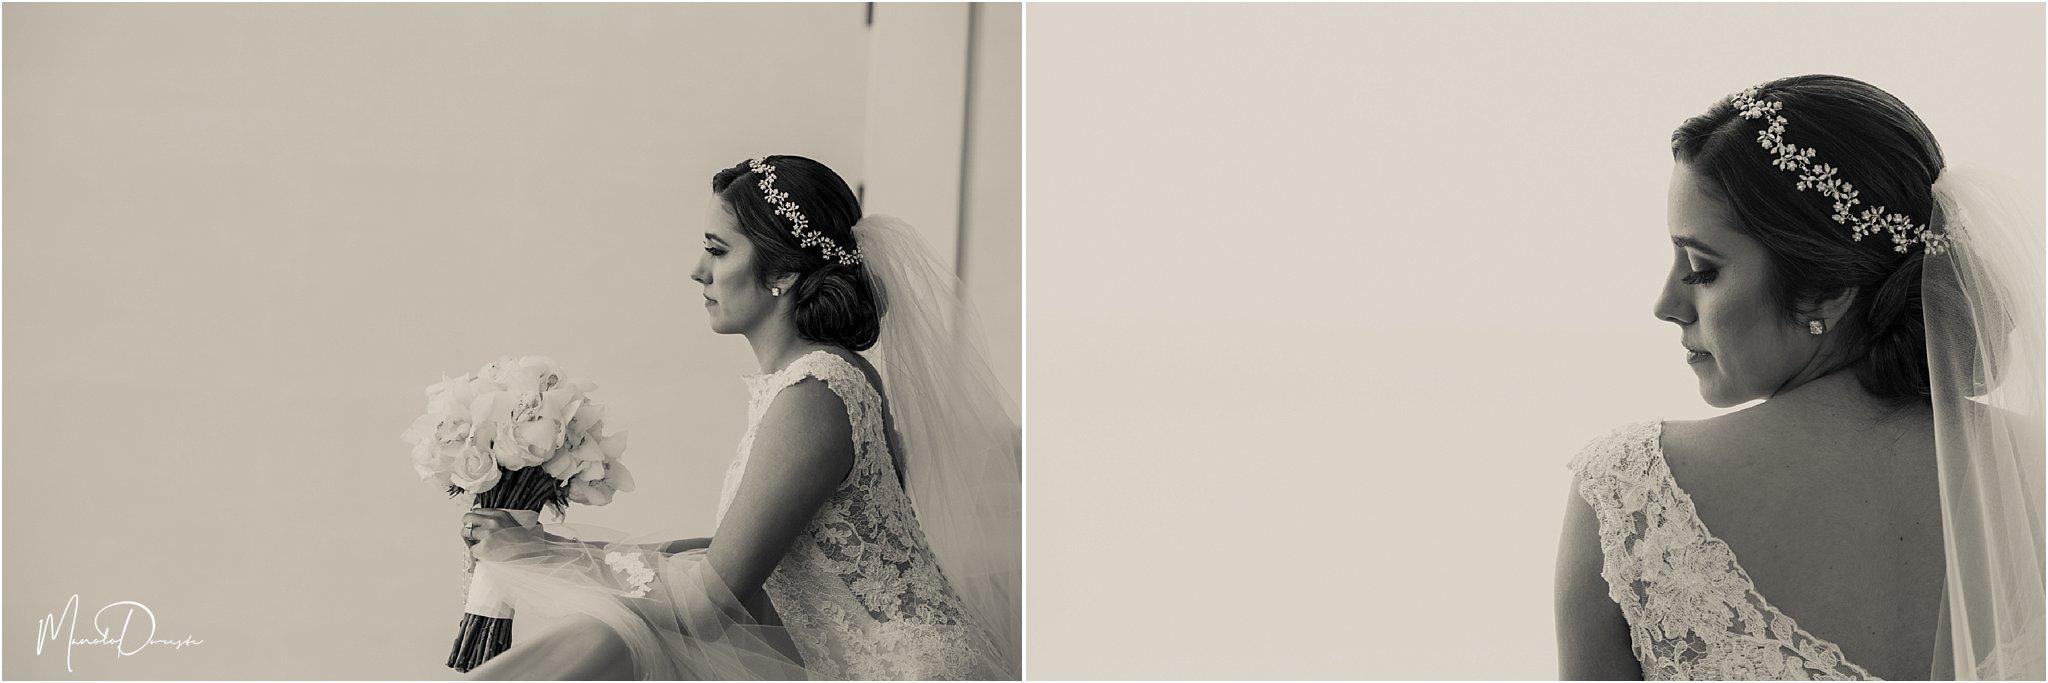 00932_ManoloDoreste_InFocusStudios_Wedding_Family_Photography_Miami_MiamiPhotographer.jpg